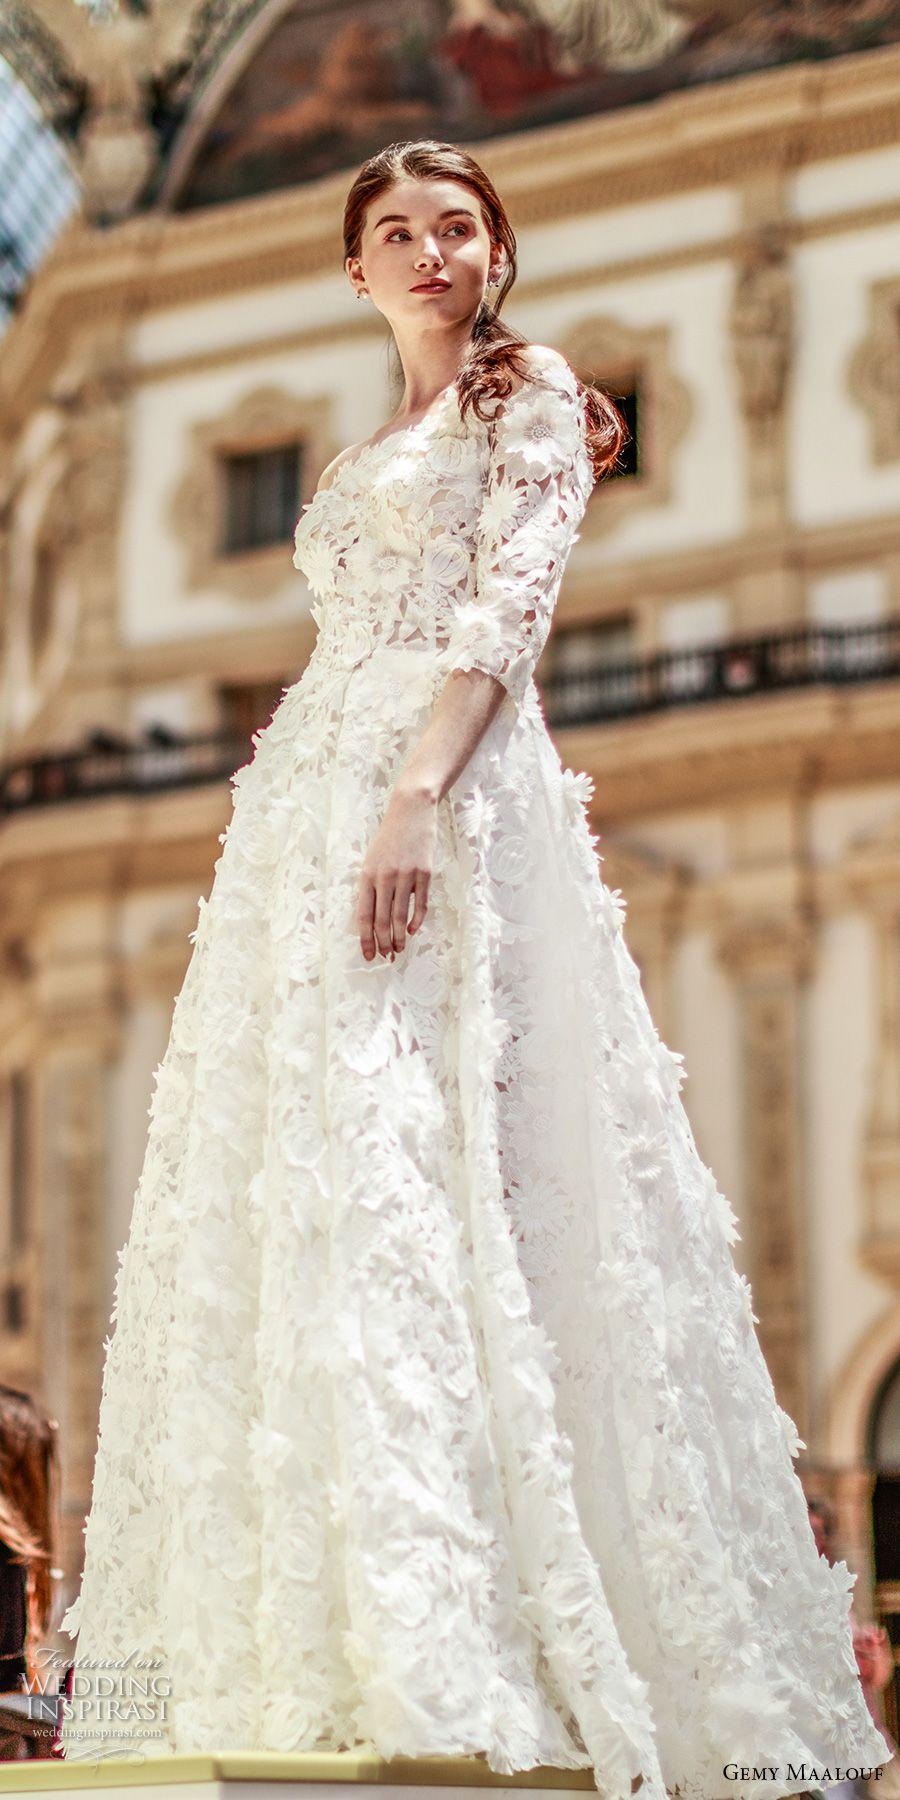 Gemy maalouf wedding dresses quarter sleeve wedding dress